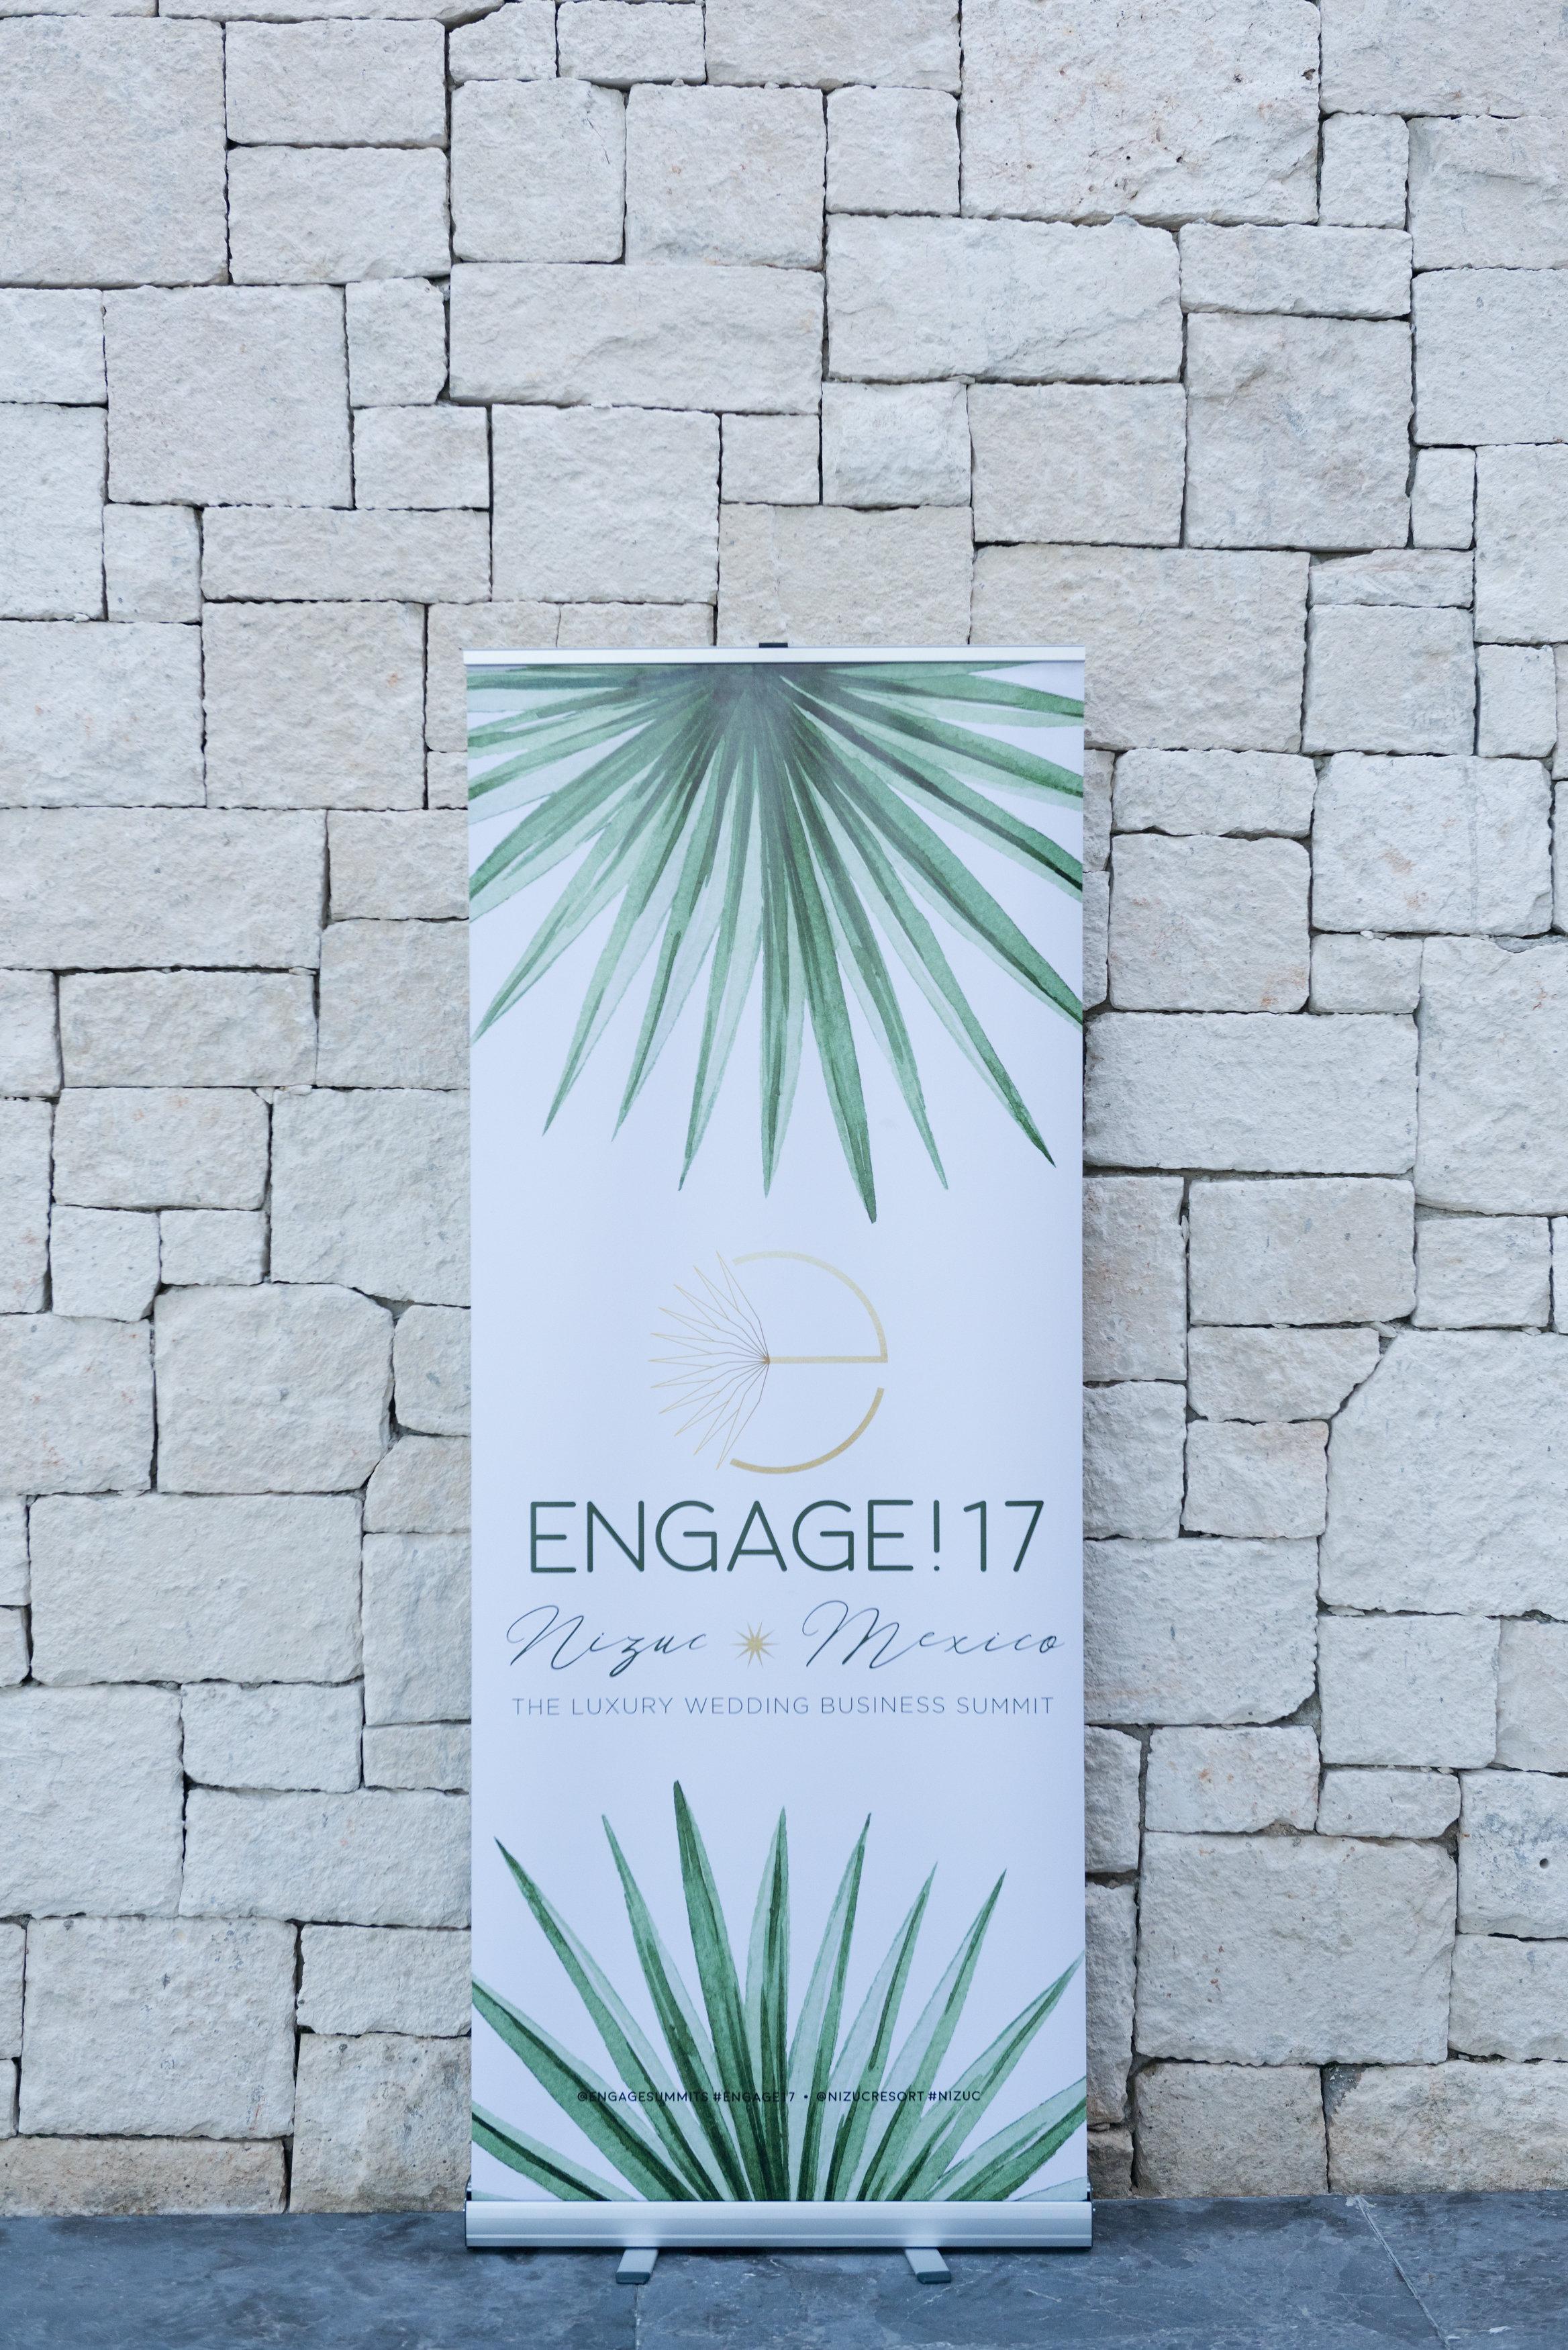 Engage!17 Nizuc: Media Lounge & Breakout Sessions - Engage Summits